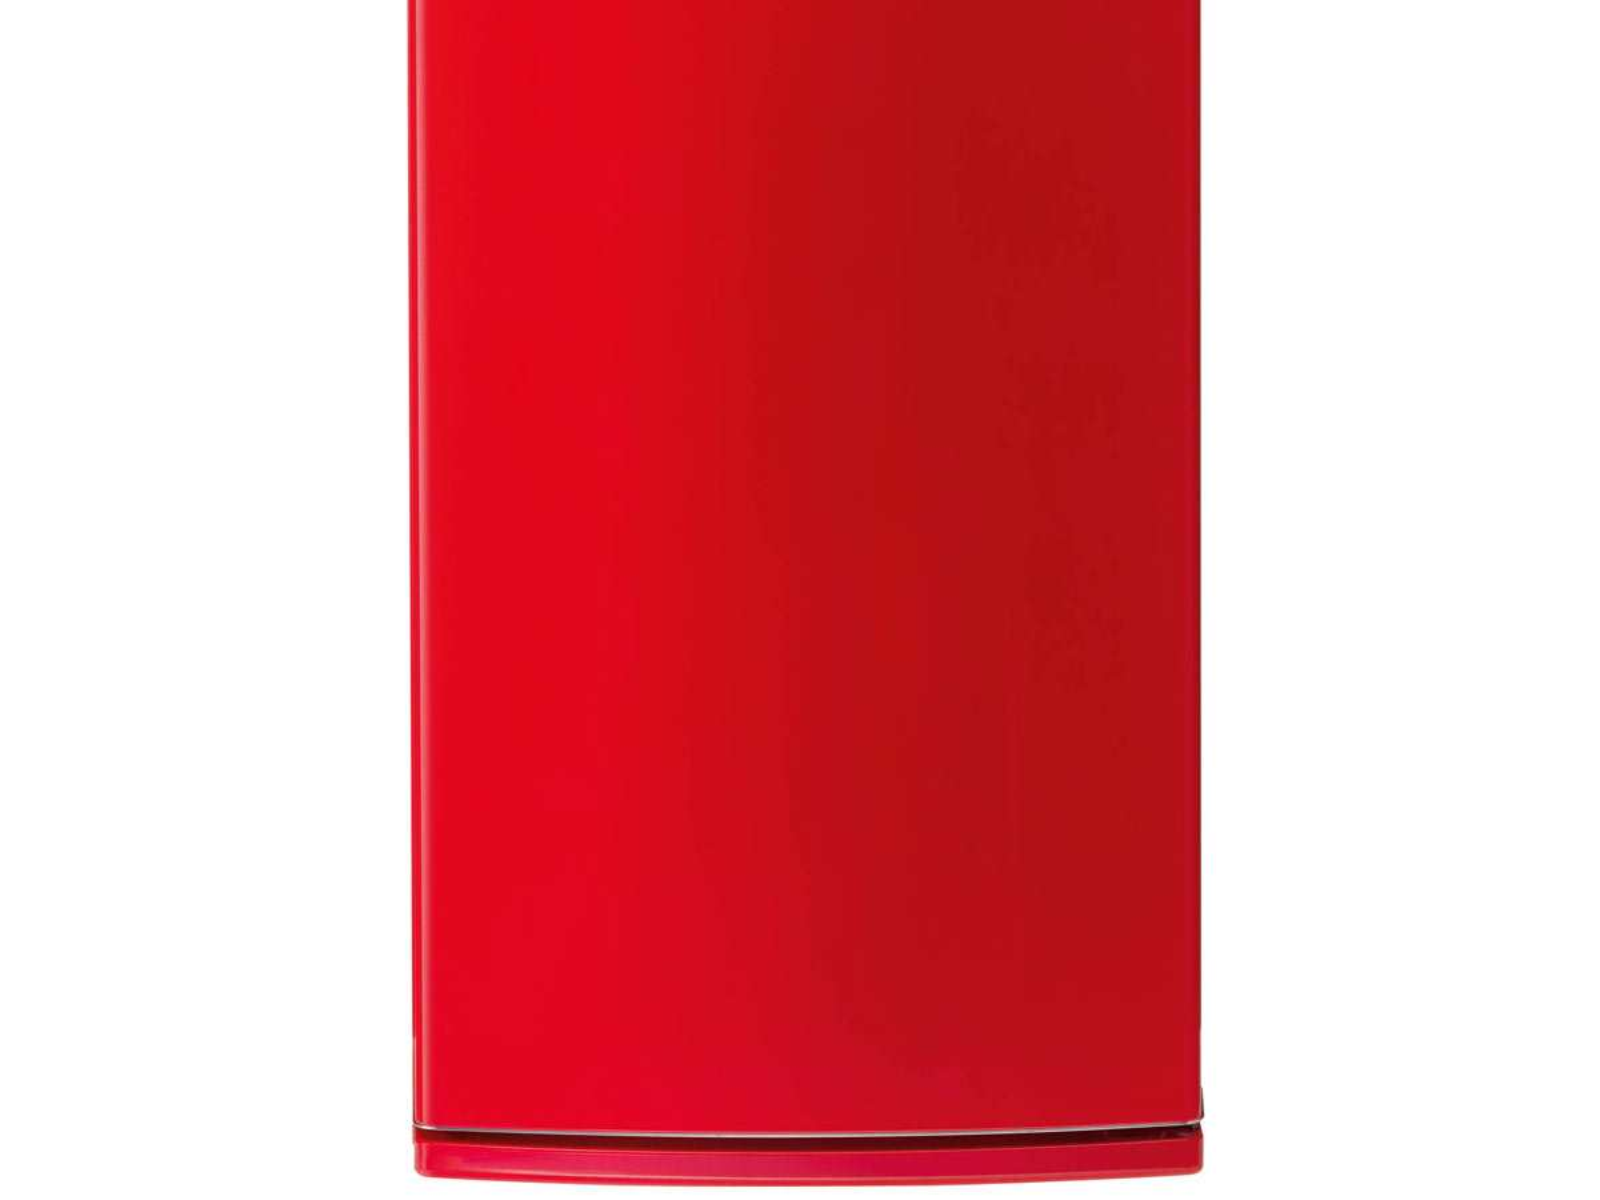 Oranier Retro Kühlschrank : Oranier rks standkühlschrank rot